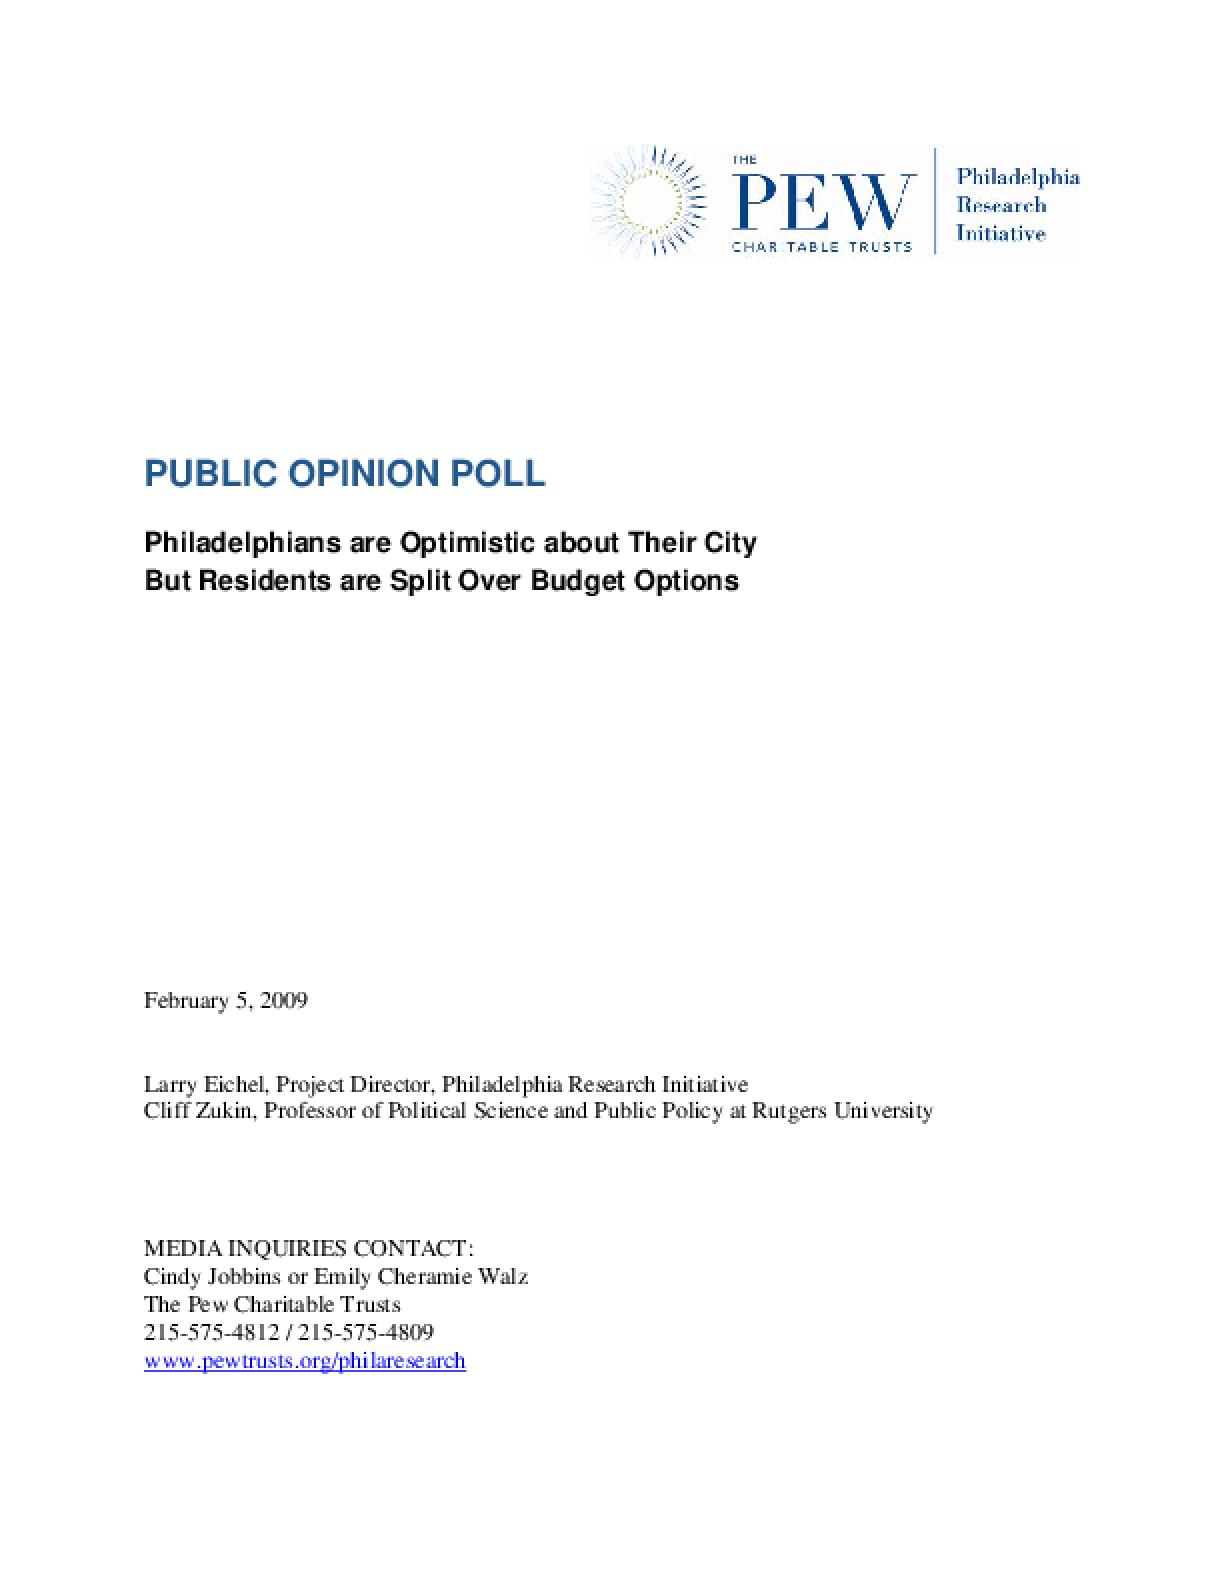 Philadelphia Research Initiative Public Opinion Poll 2009